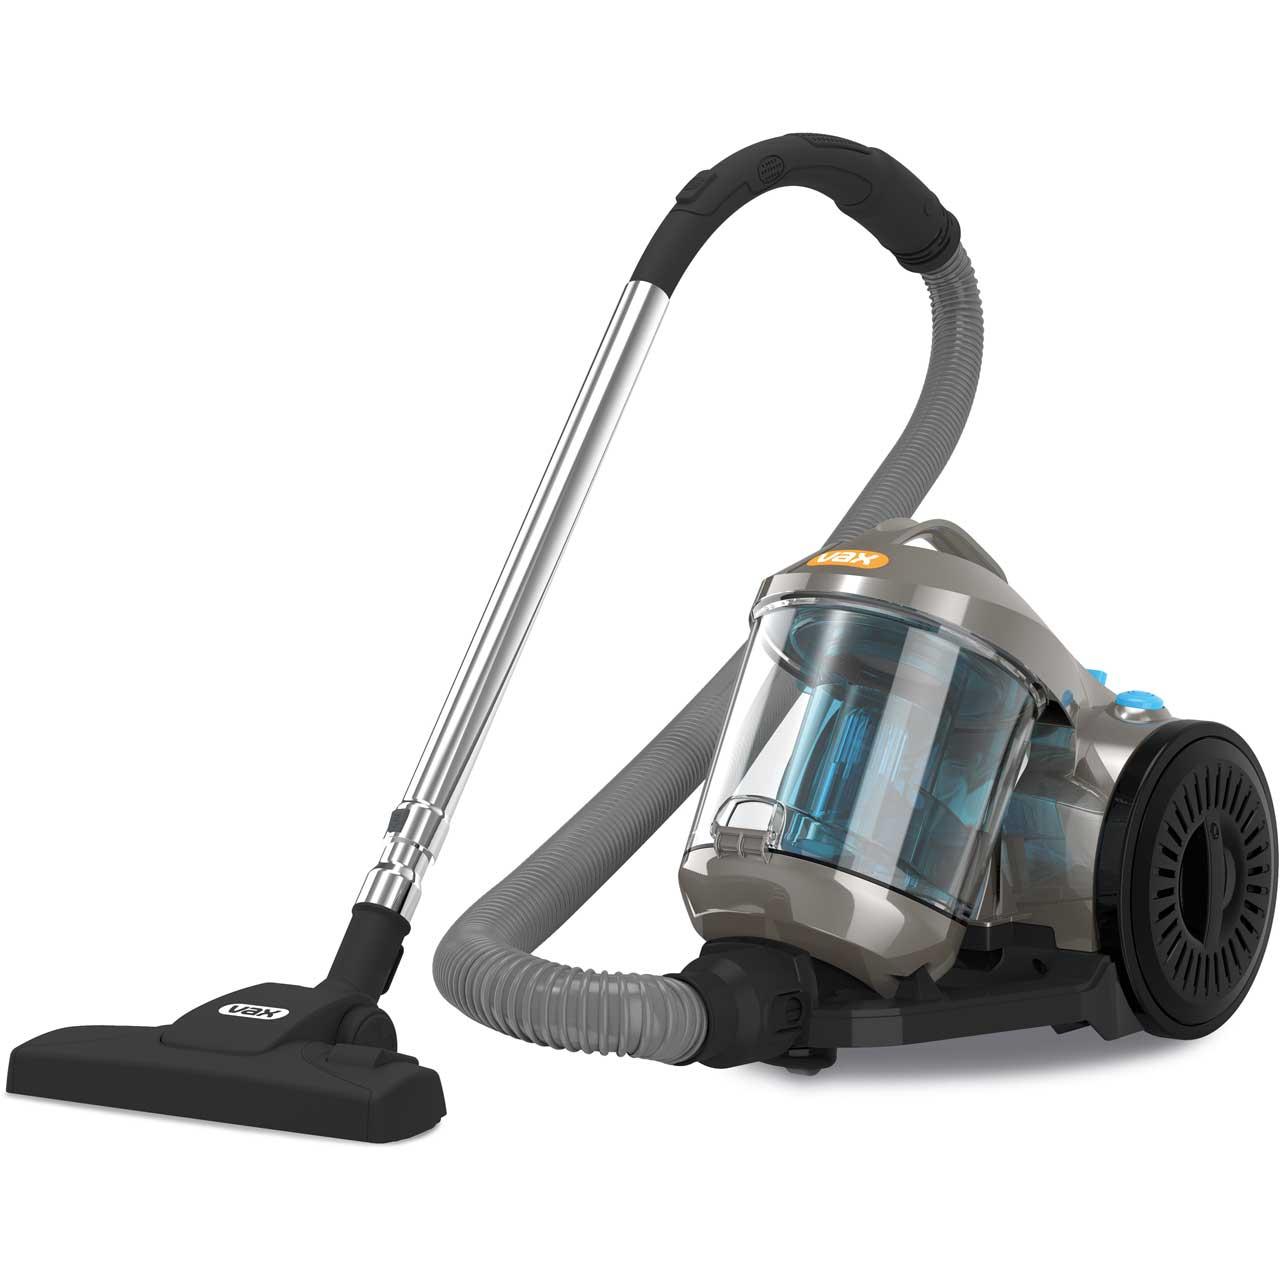 dyson multi floor dc40mf bagless upright vacuum cleaner. Black Bedroom Furniture Sets. Home Design Ideas